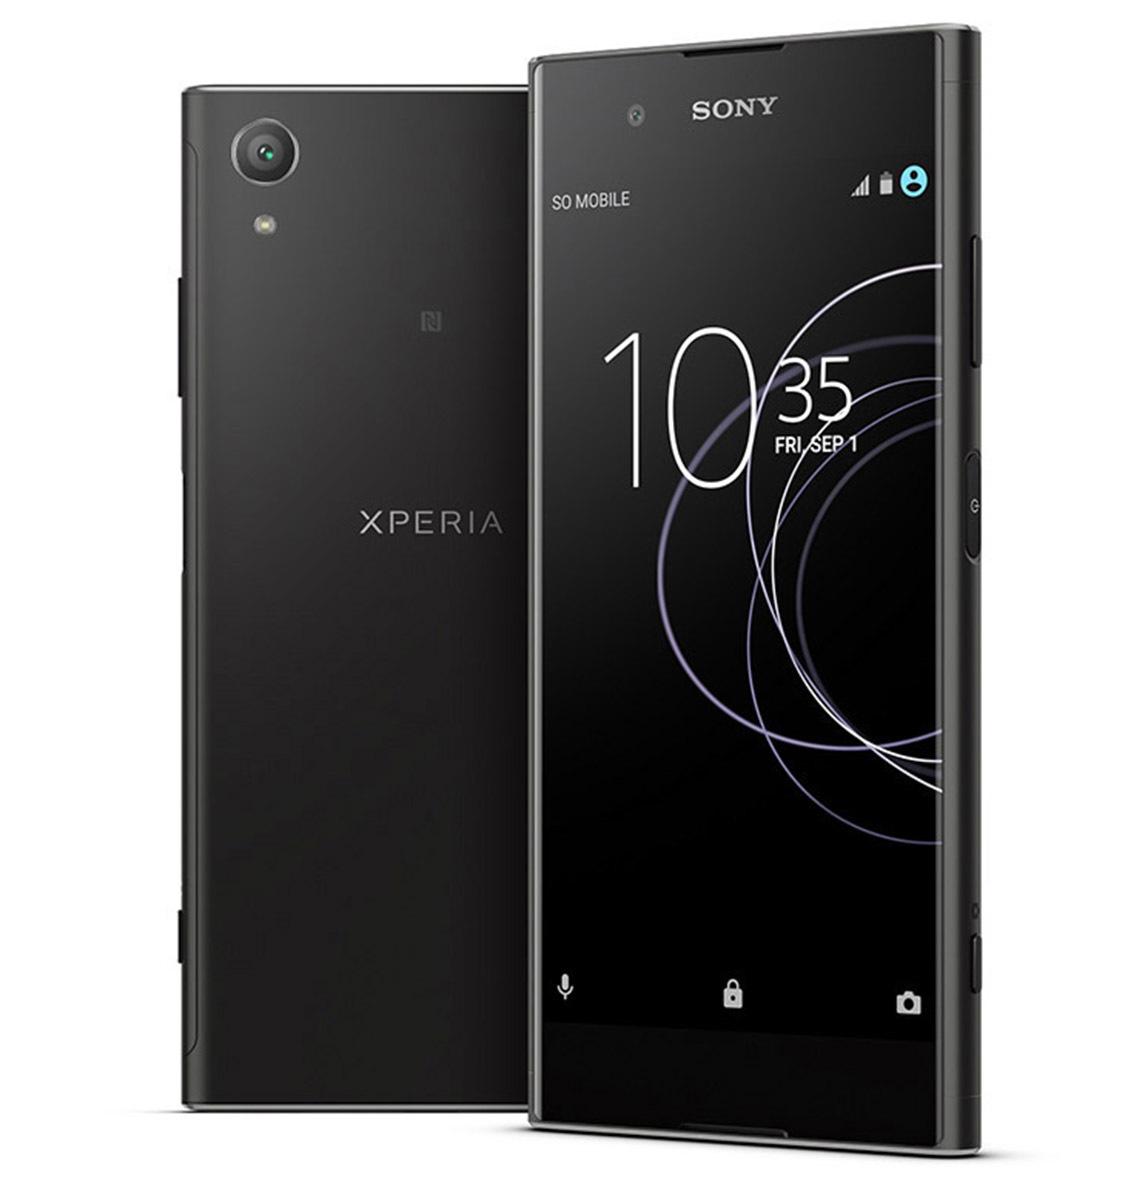 Смартфон Sony Xperia XA1 Plus, цвет чёрный